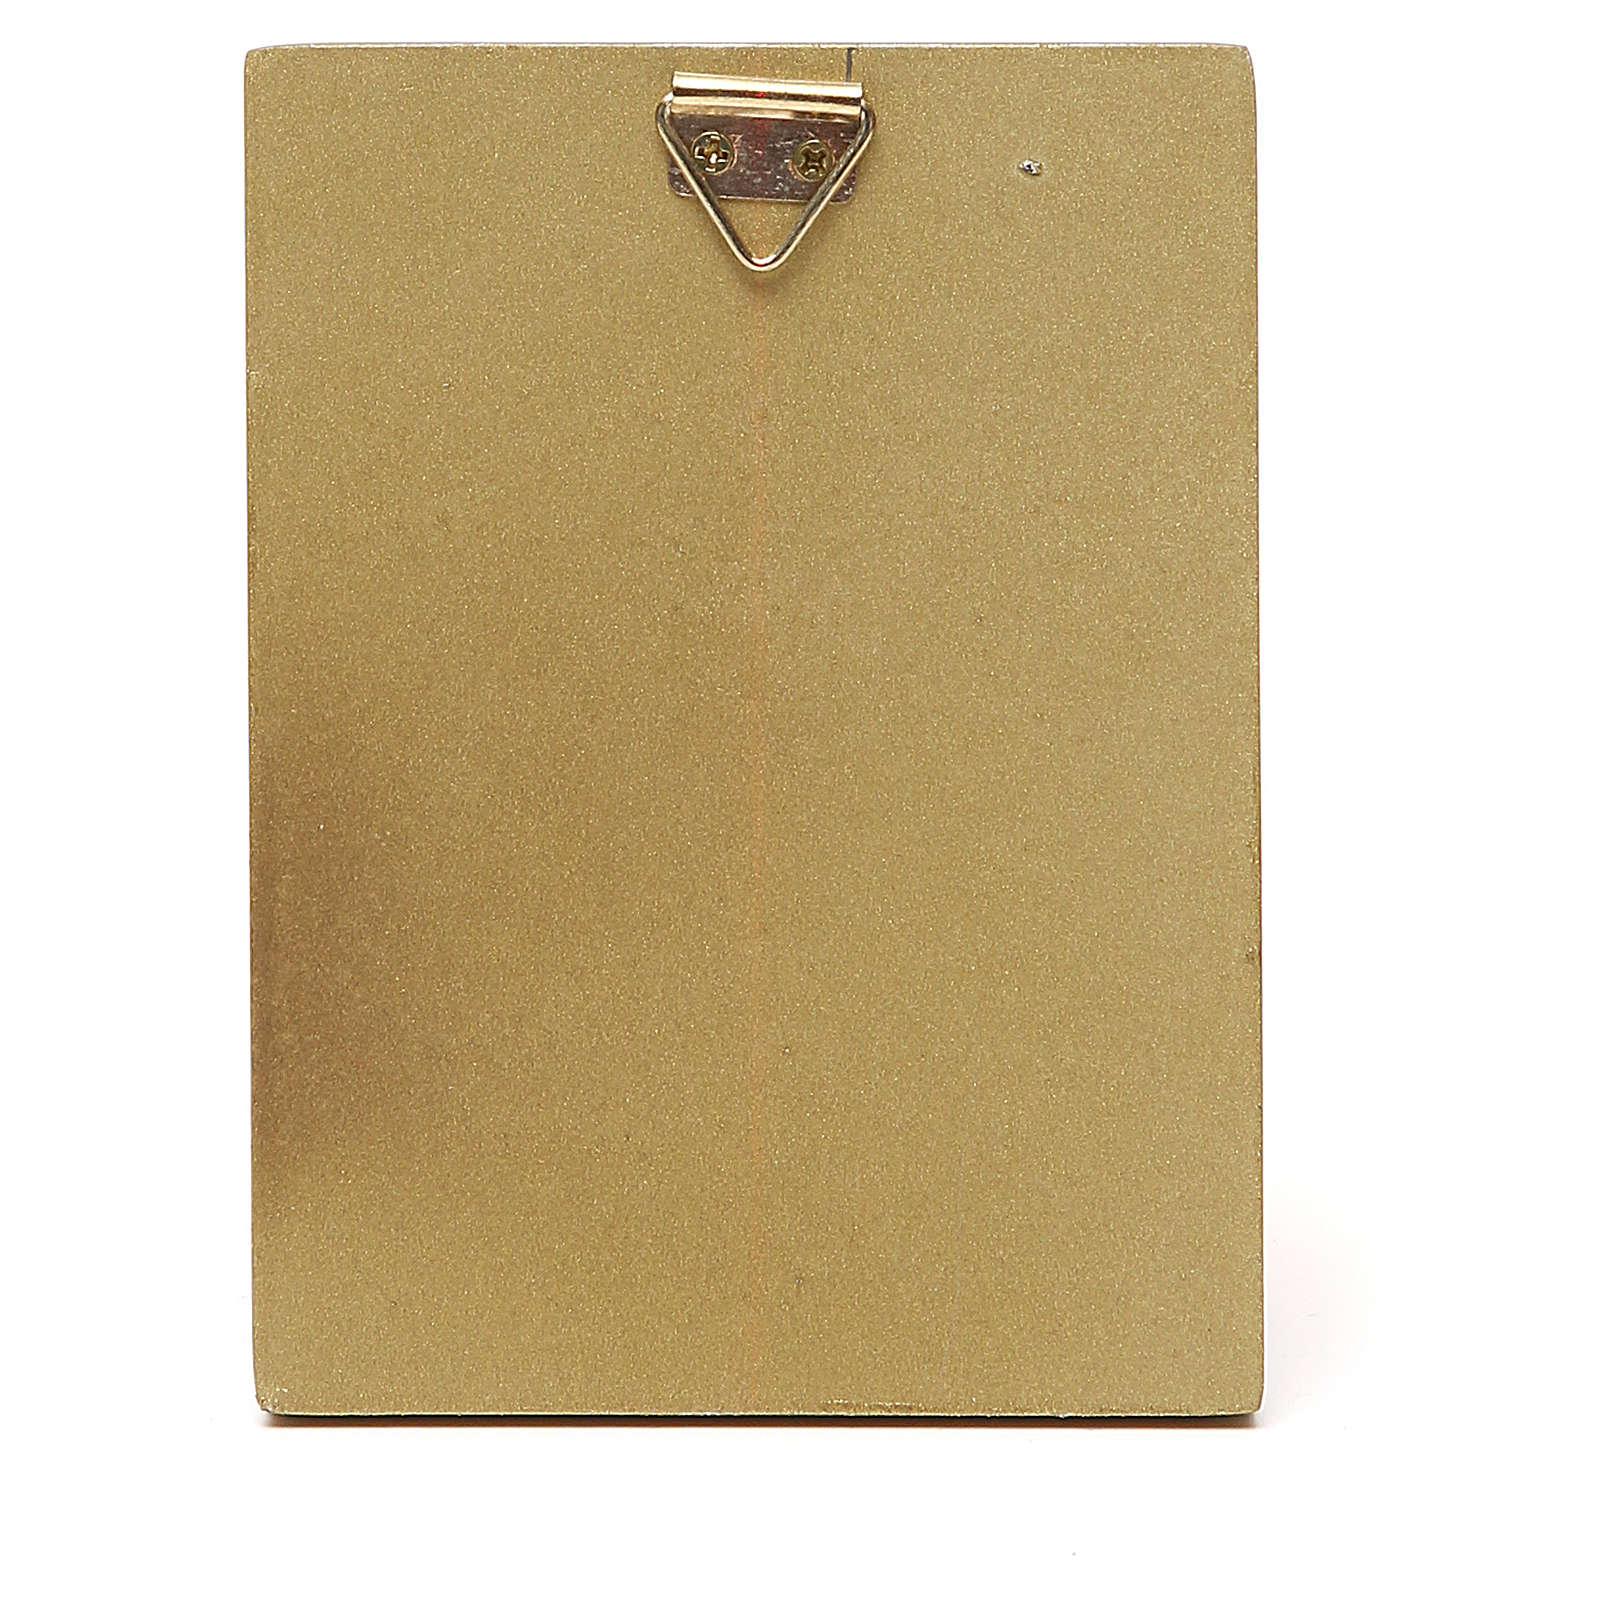 STOCK Cuadrito madera Ángel borde oro 10x6,5 cm 3